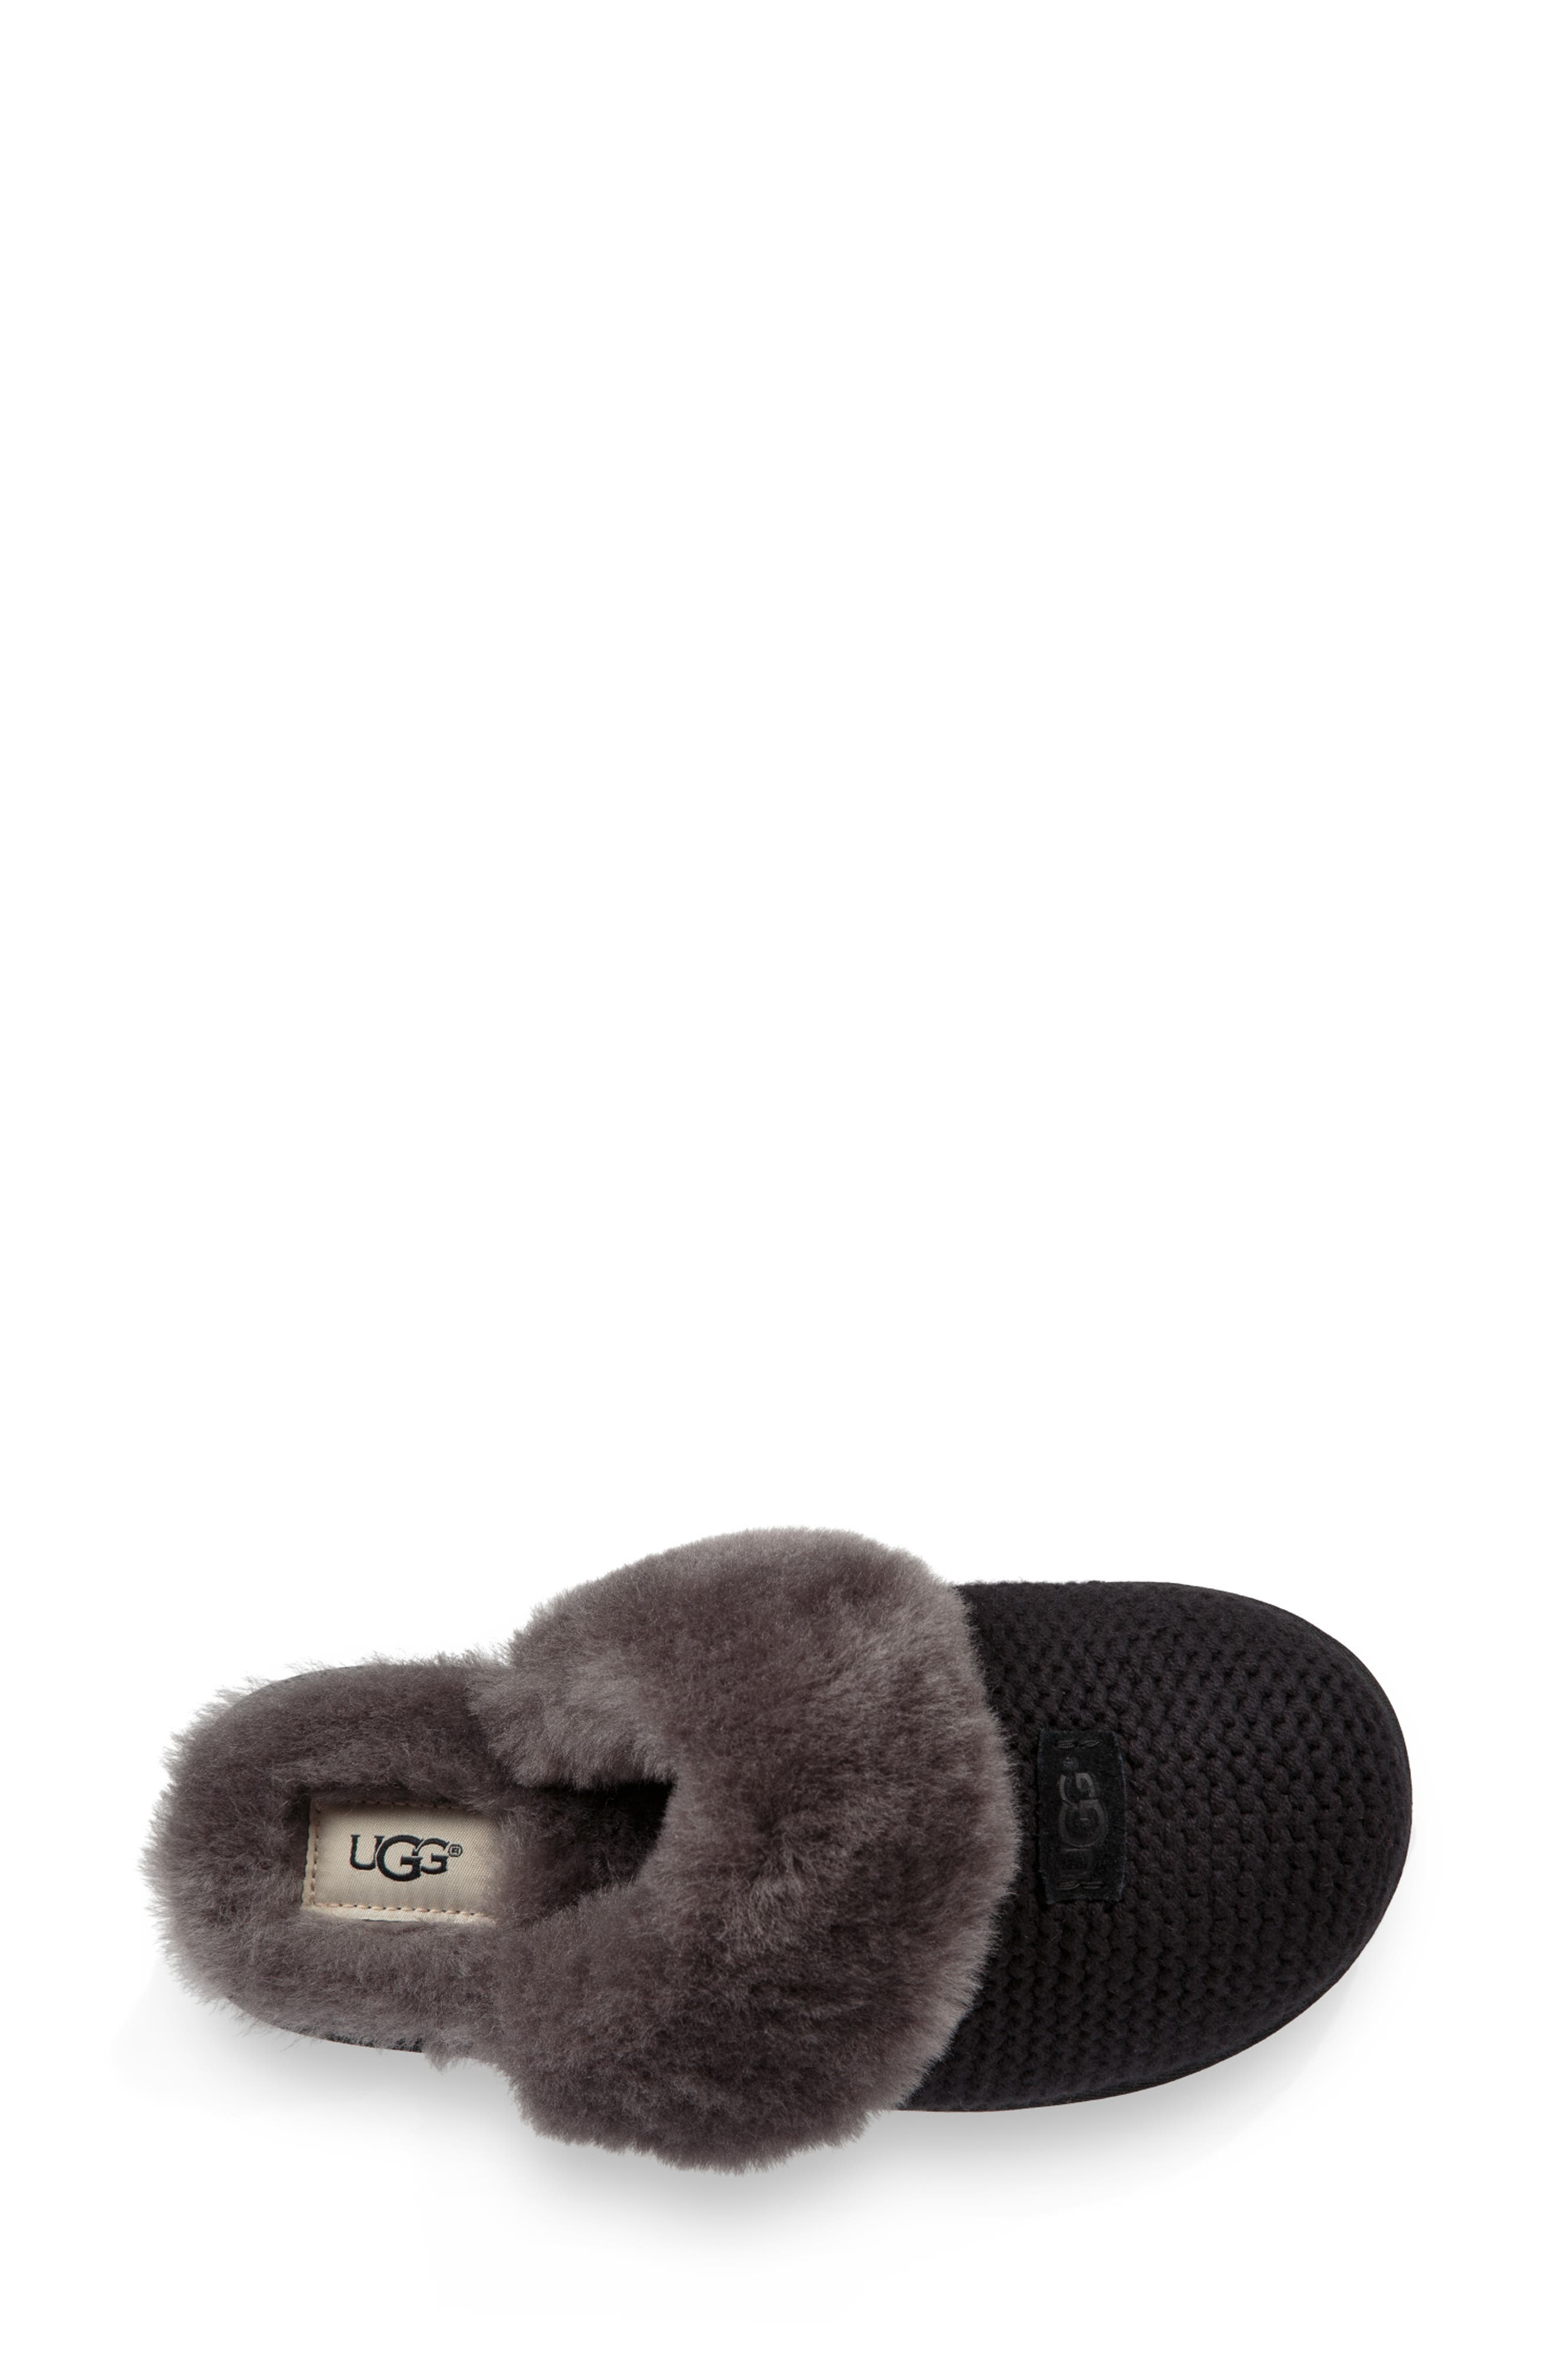 Cozy Knit Genuine Shearling Slipper,                             Alternate thumbnail 4, color,                             BLACK